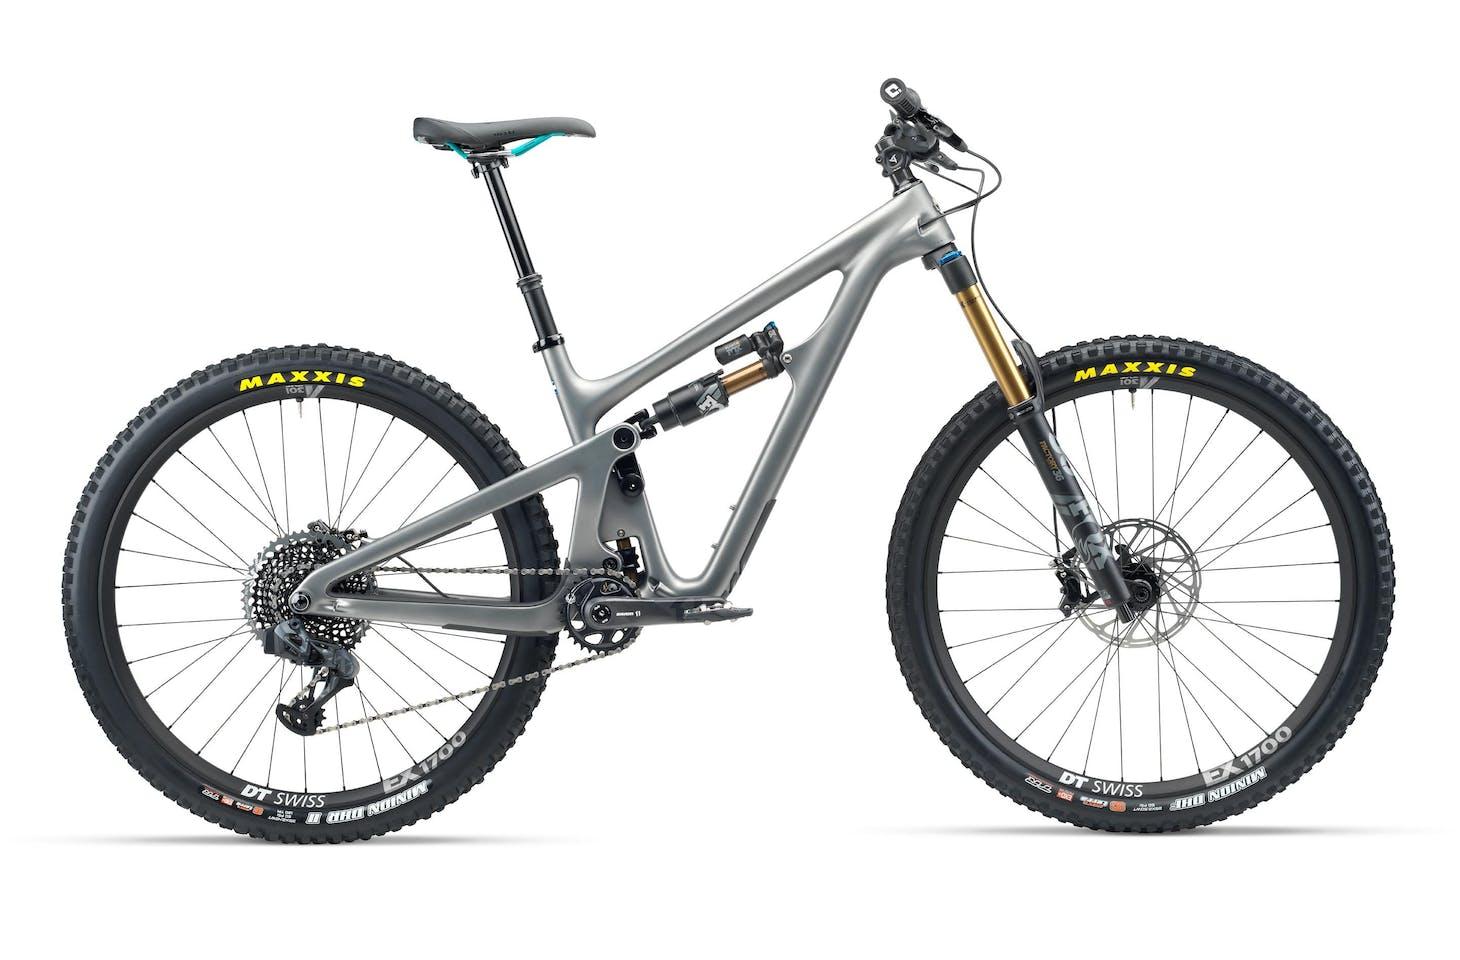 Yeti bike model SB150